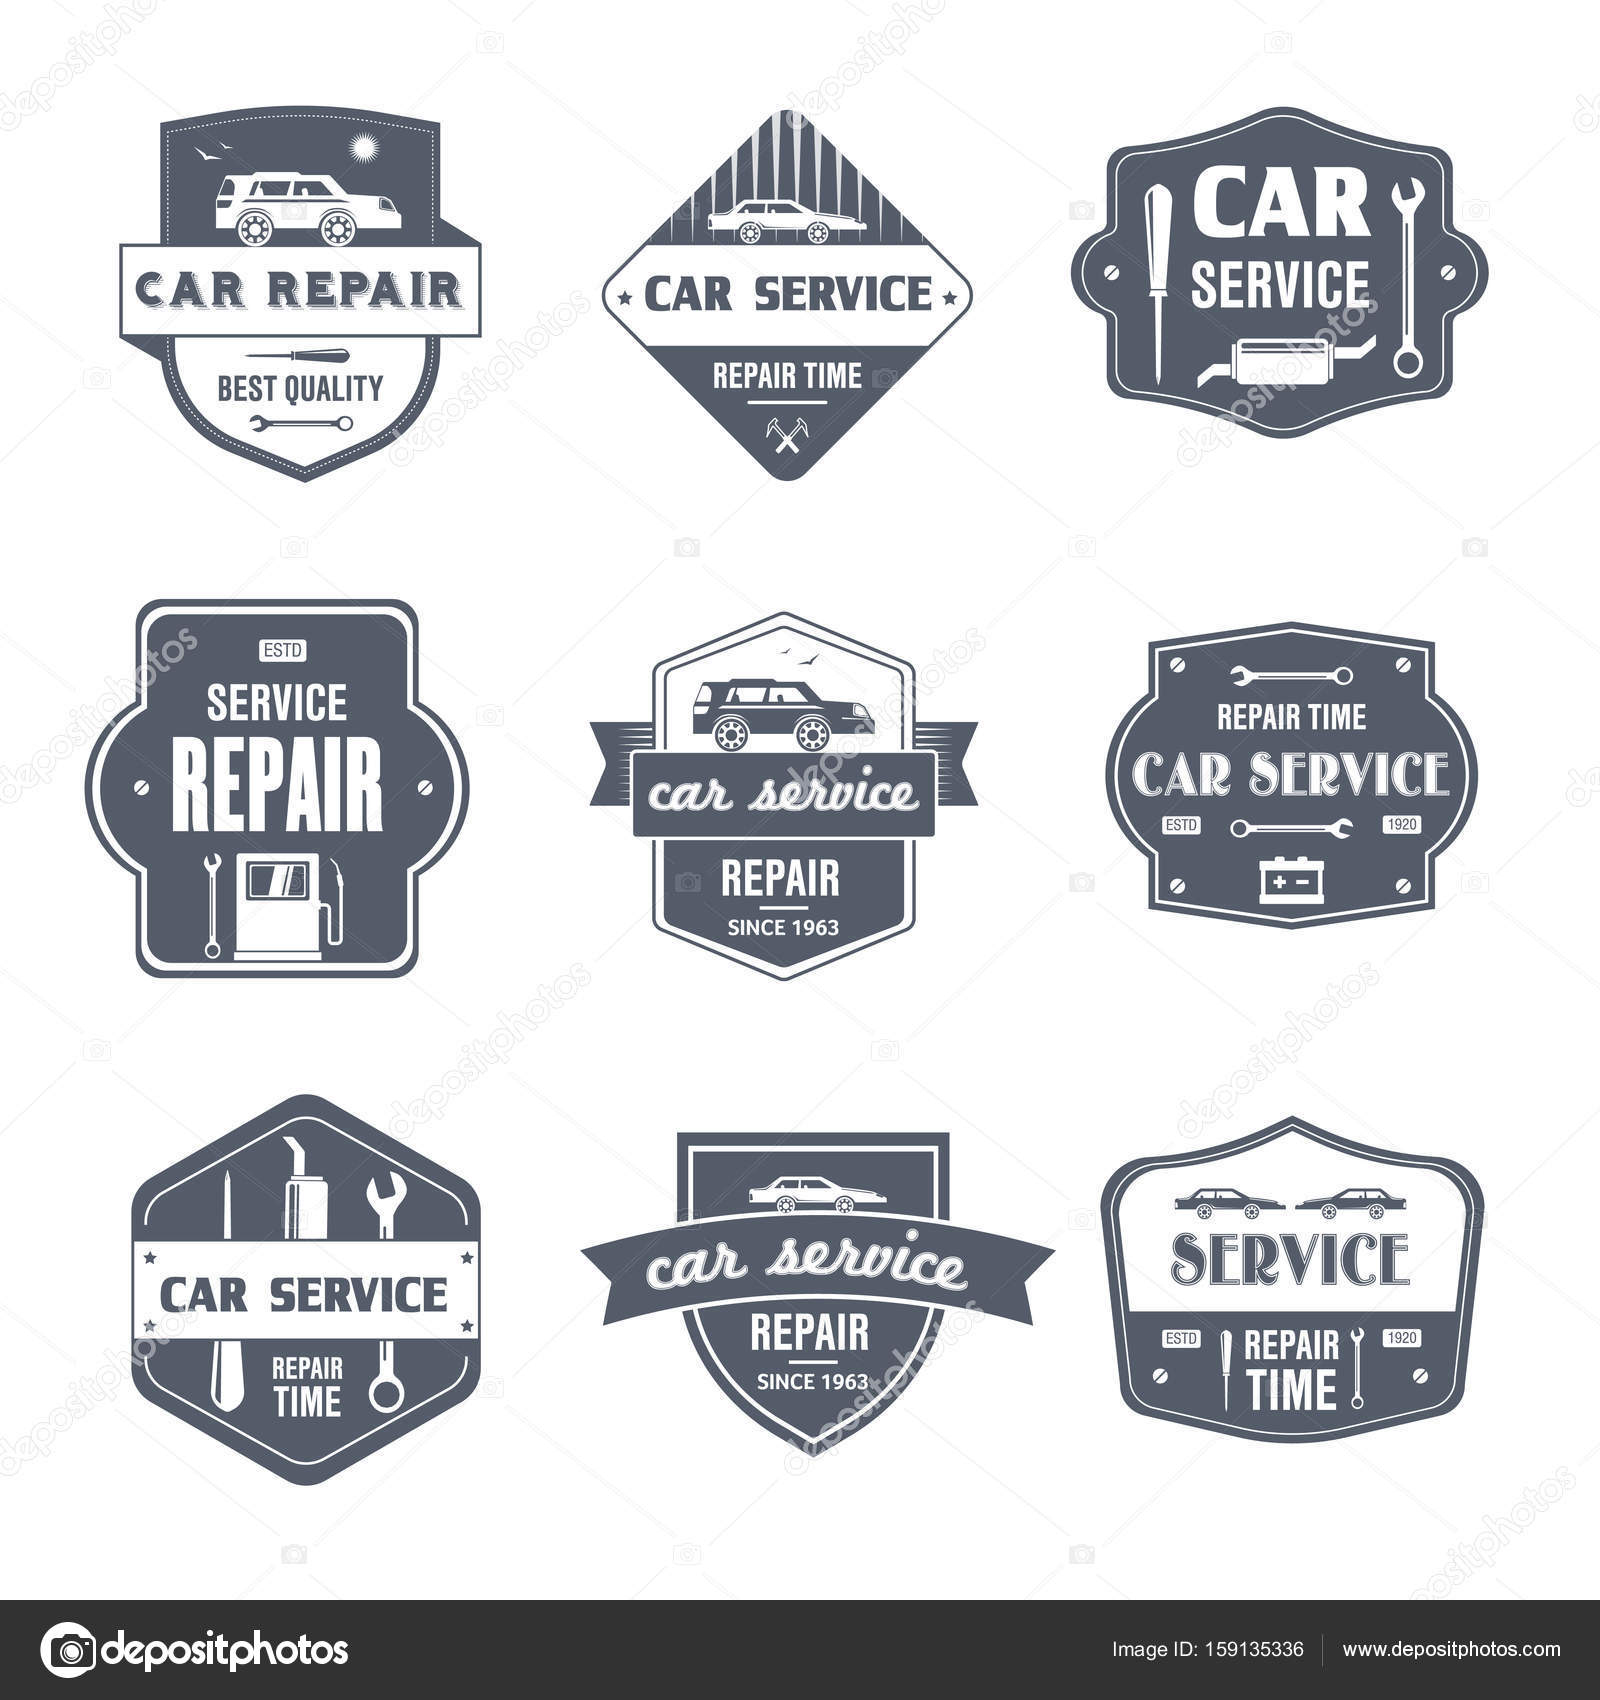 Kfz-Reparatur - Vintage Vektor-Set von logos — Stockvektor ...